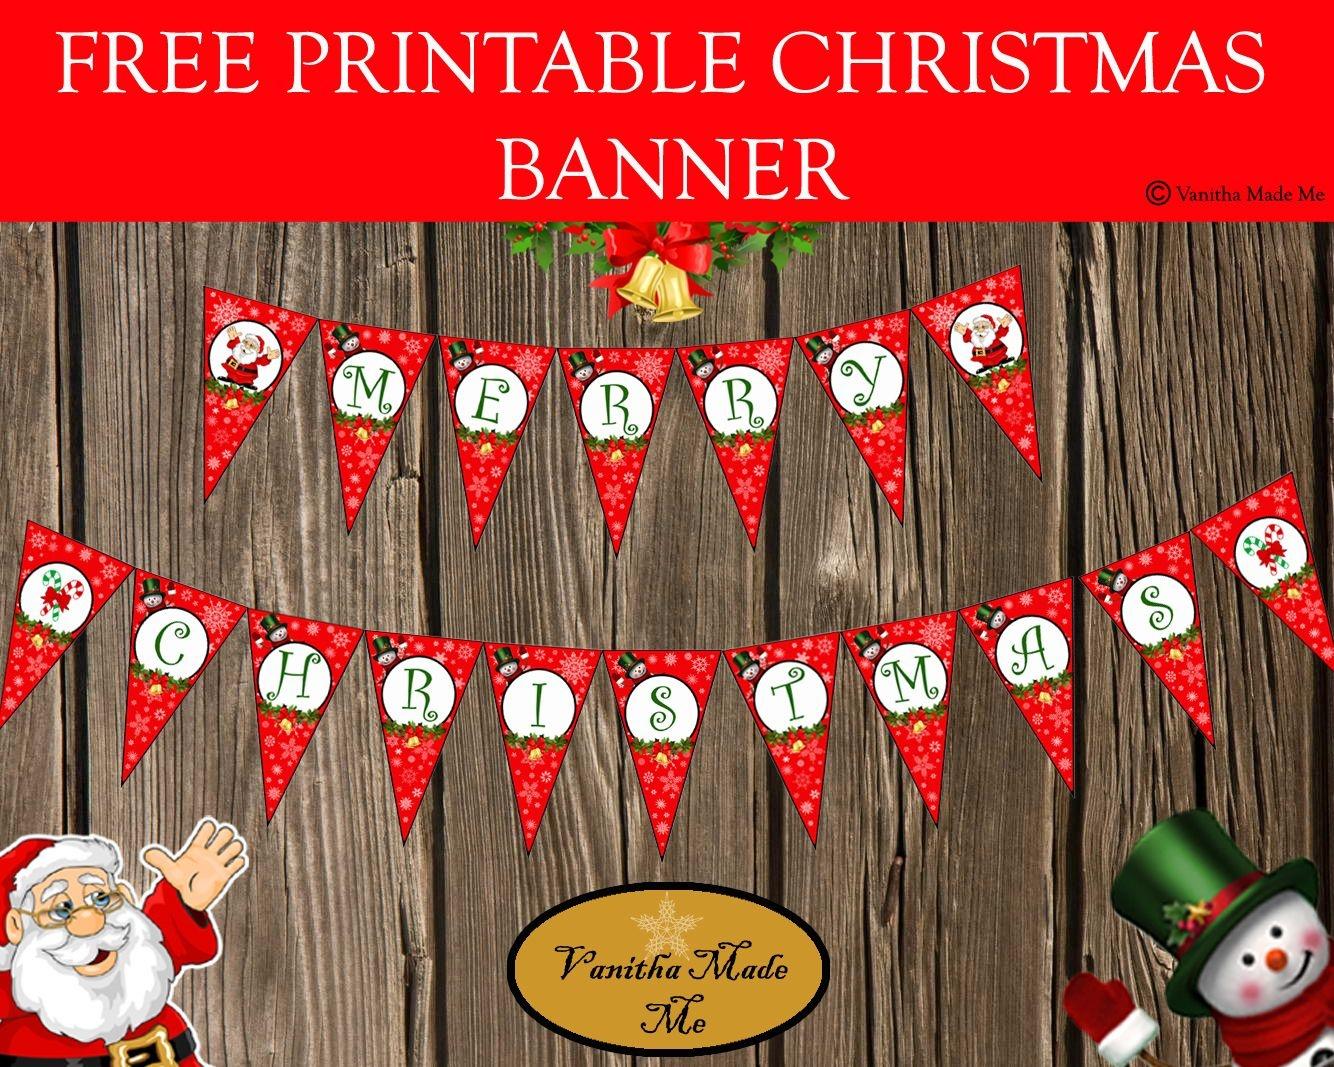 Free Printable Christmas Banner   Kreatívságok - Free Printable Christmas Banner